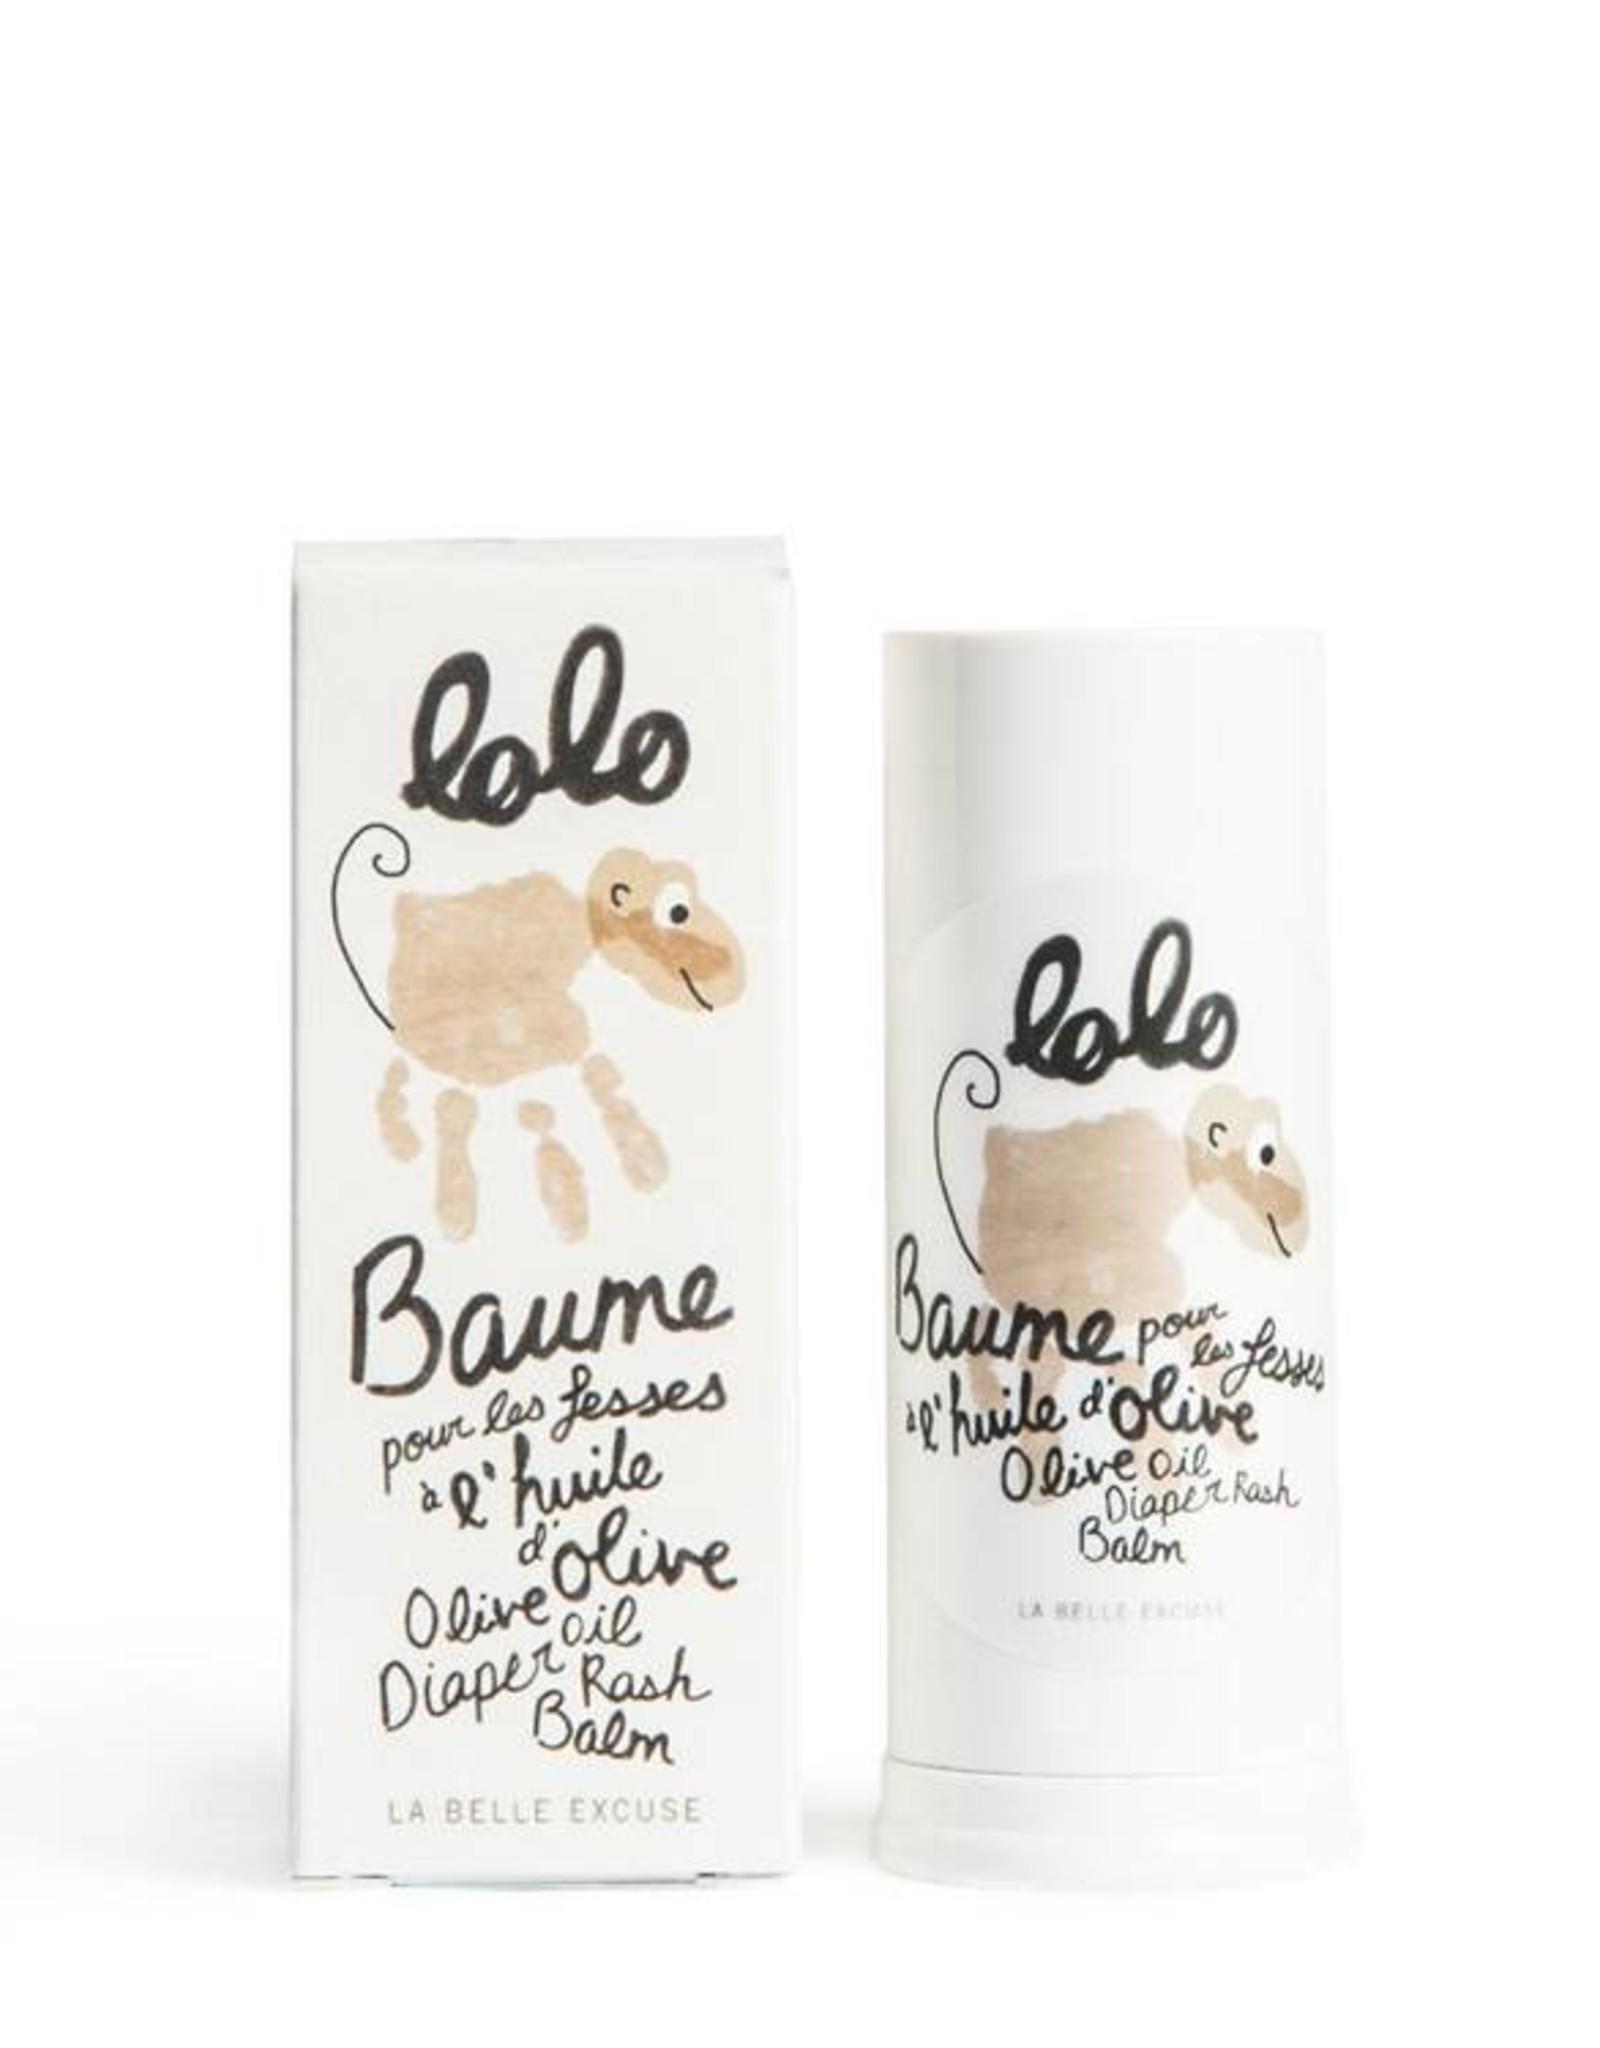 Lolo et moi Olive oil diaper rash balm